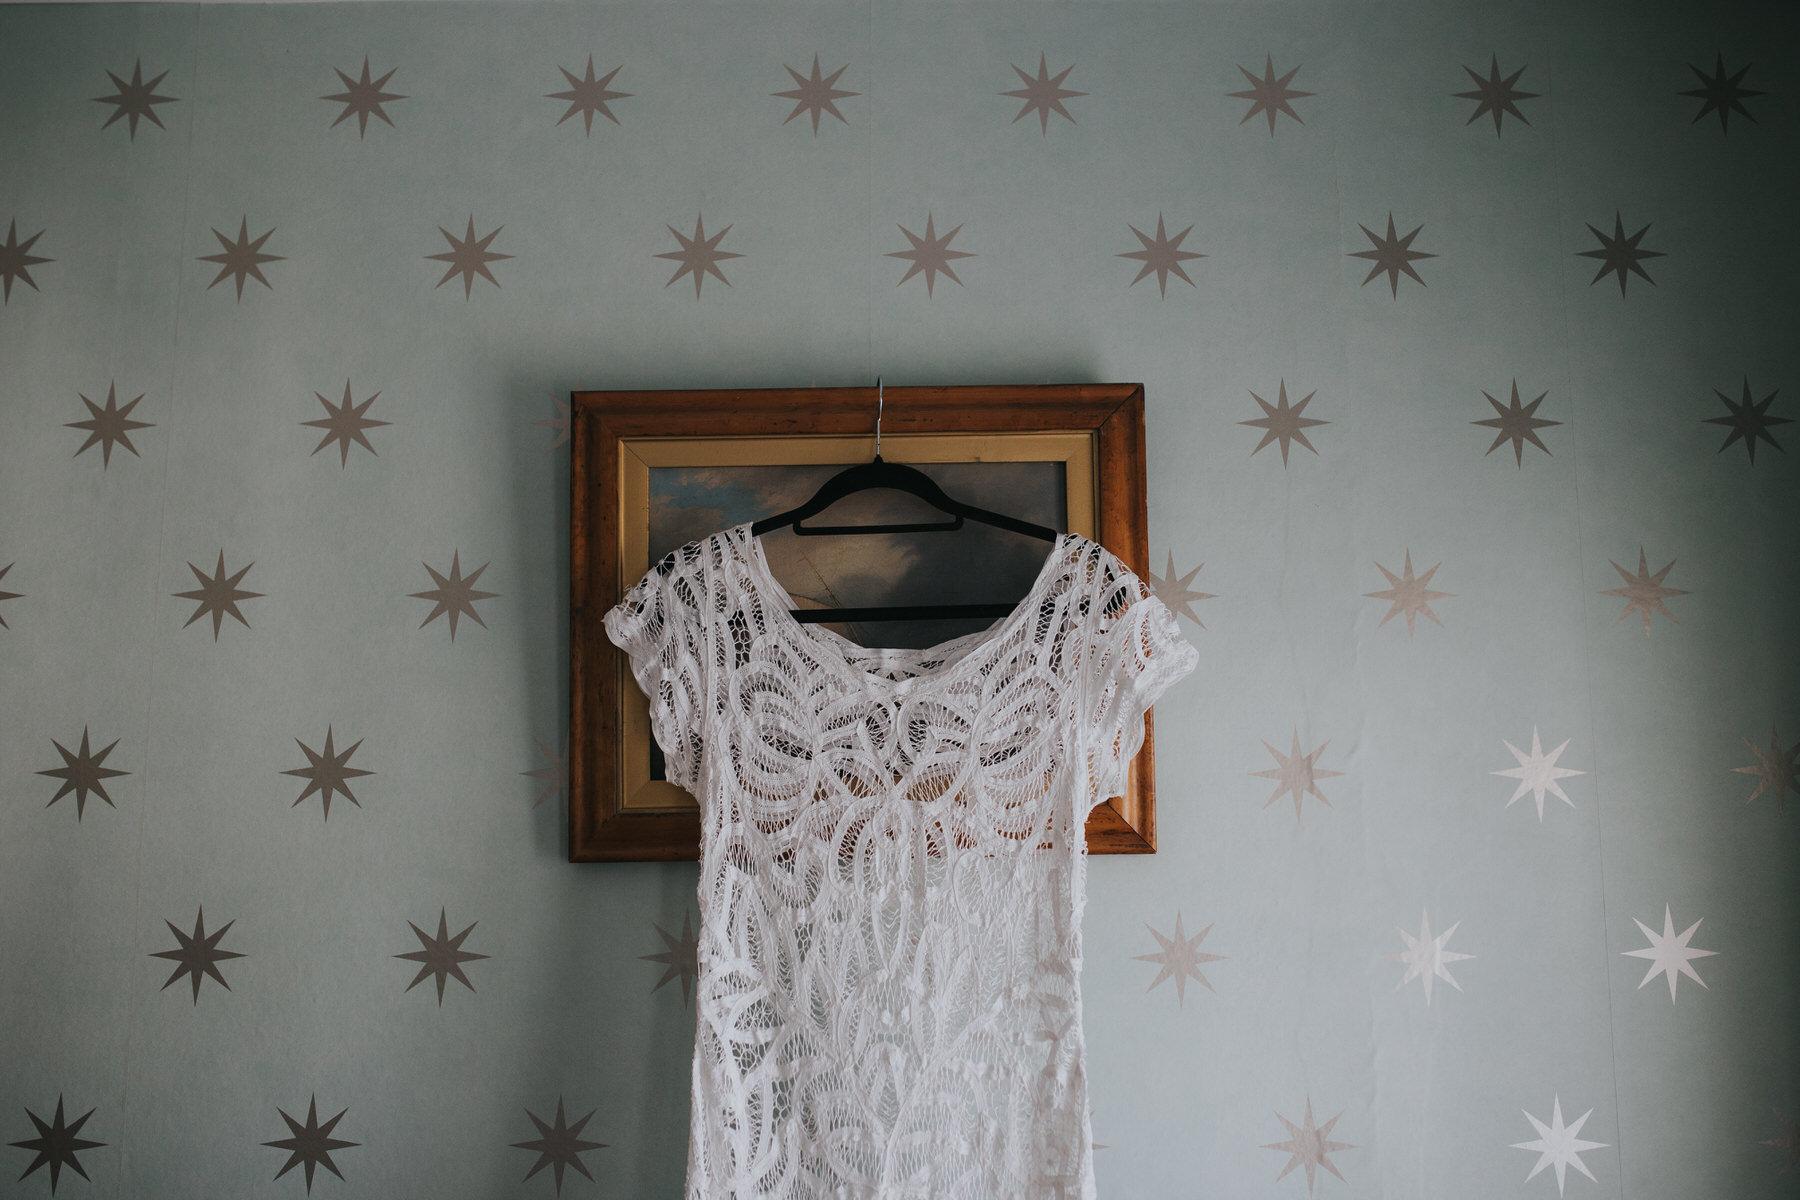 180 lace wedding dress hanging against silver star wallpaper Portmeirion.jpg